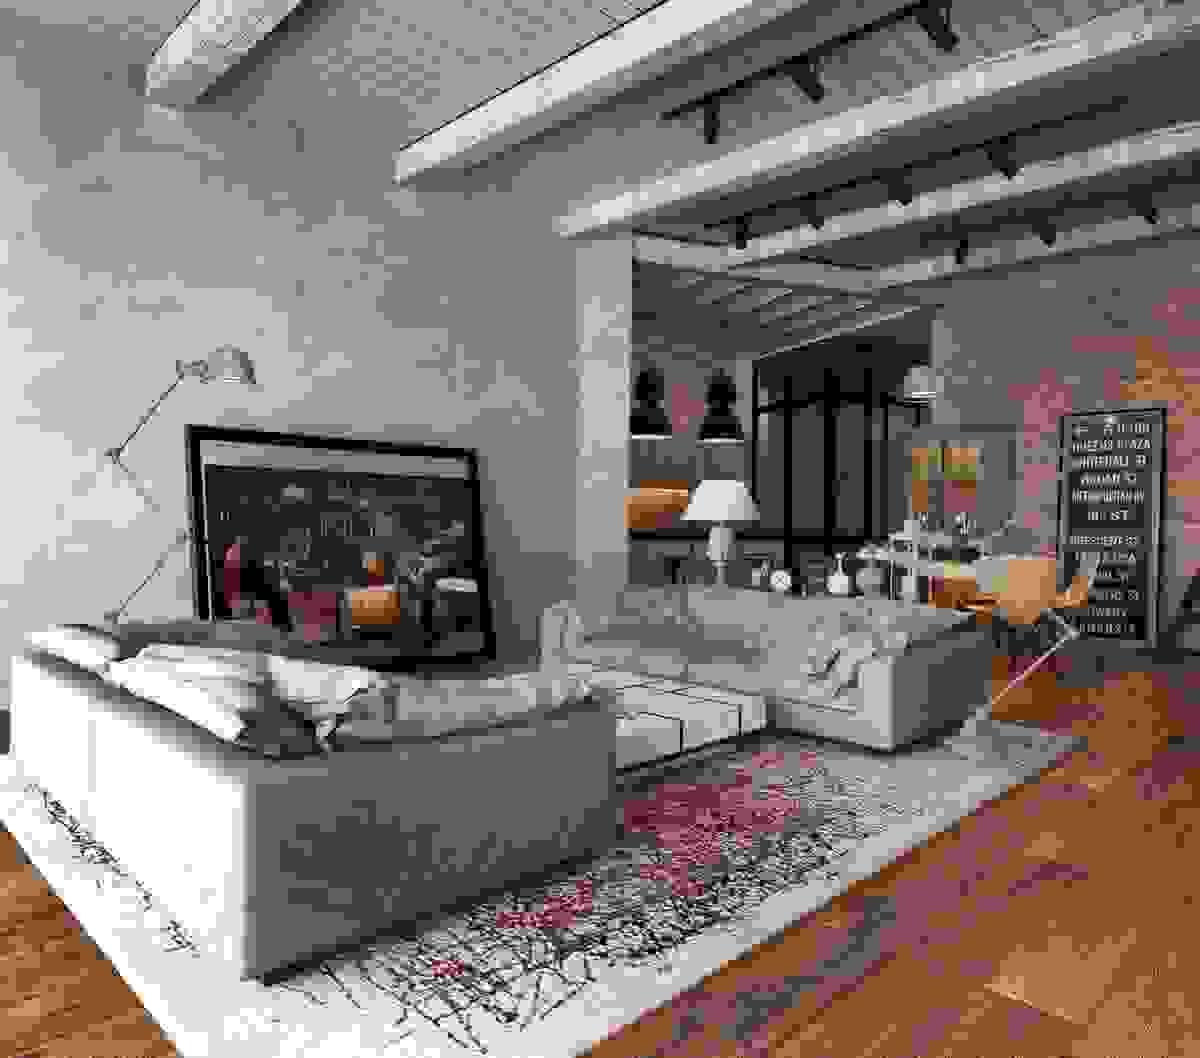 Image source: home-designing.com